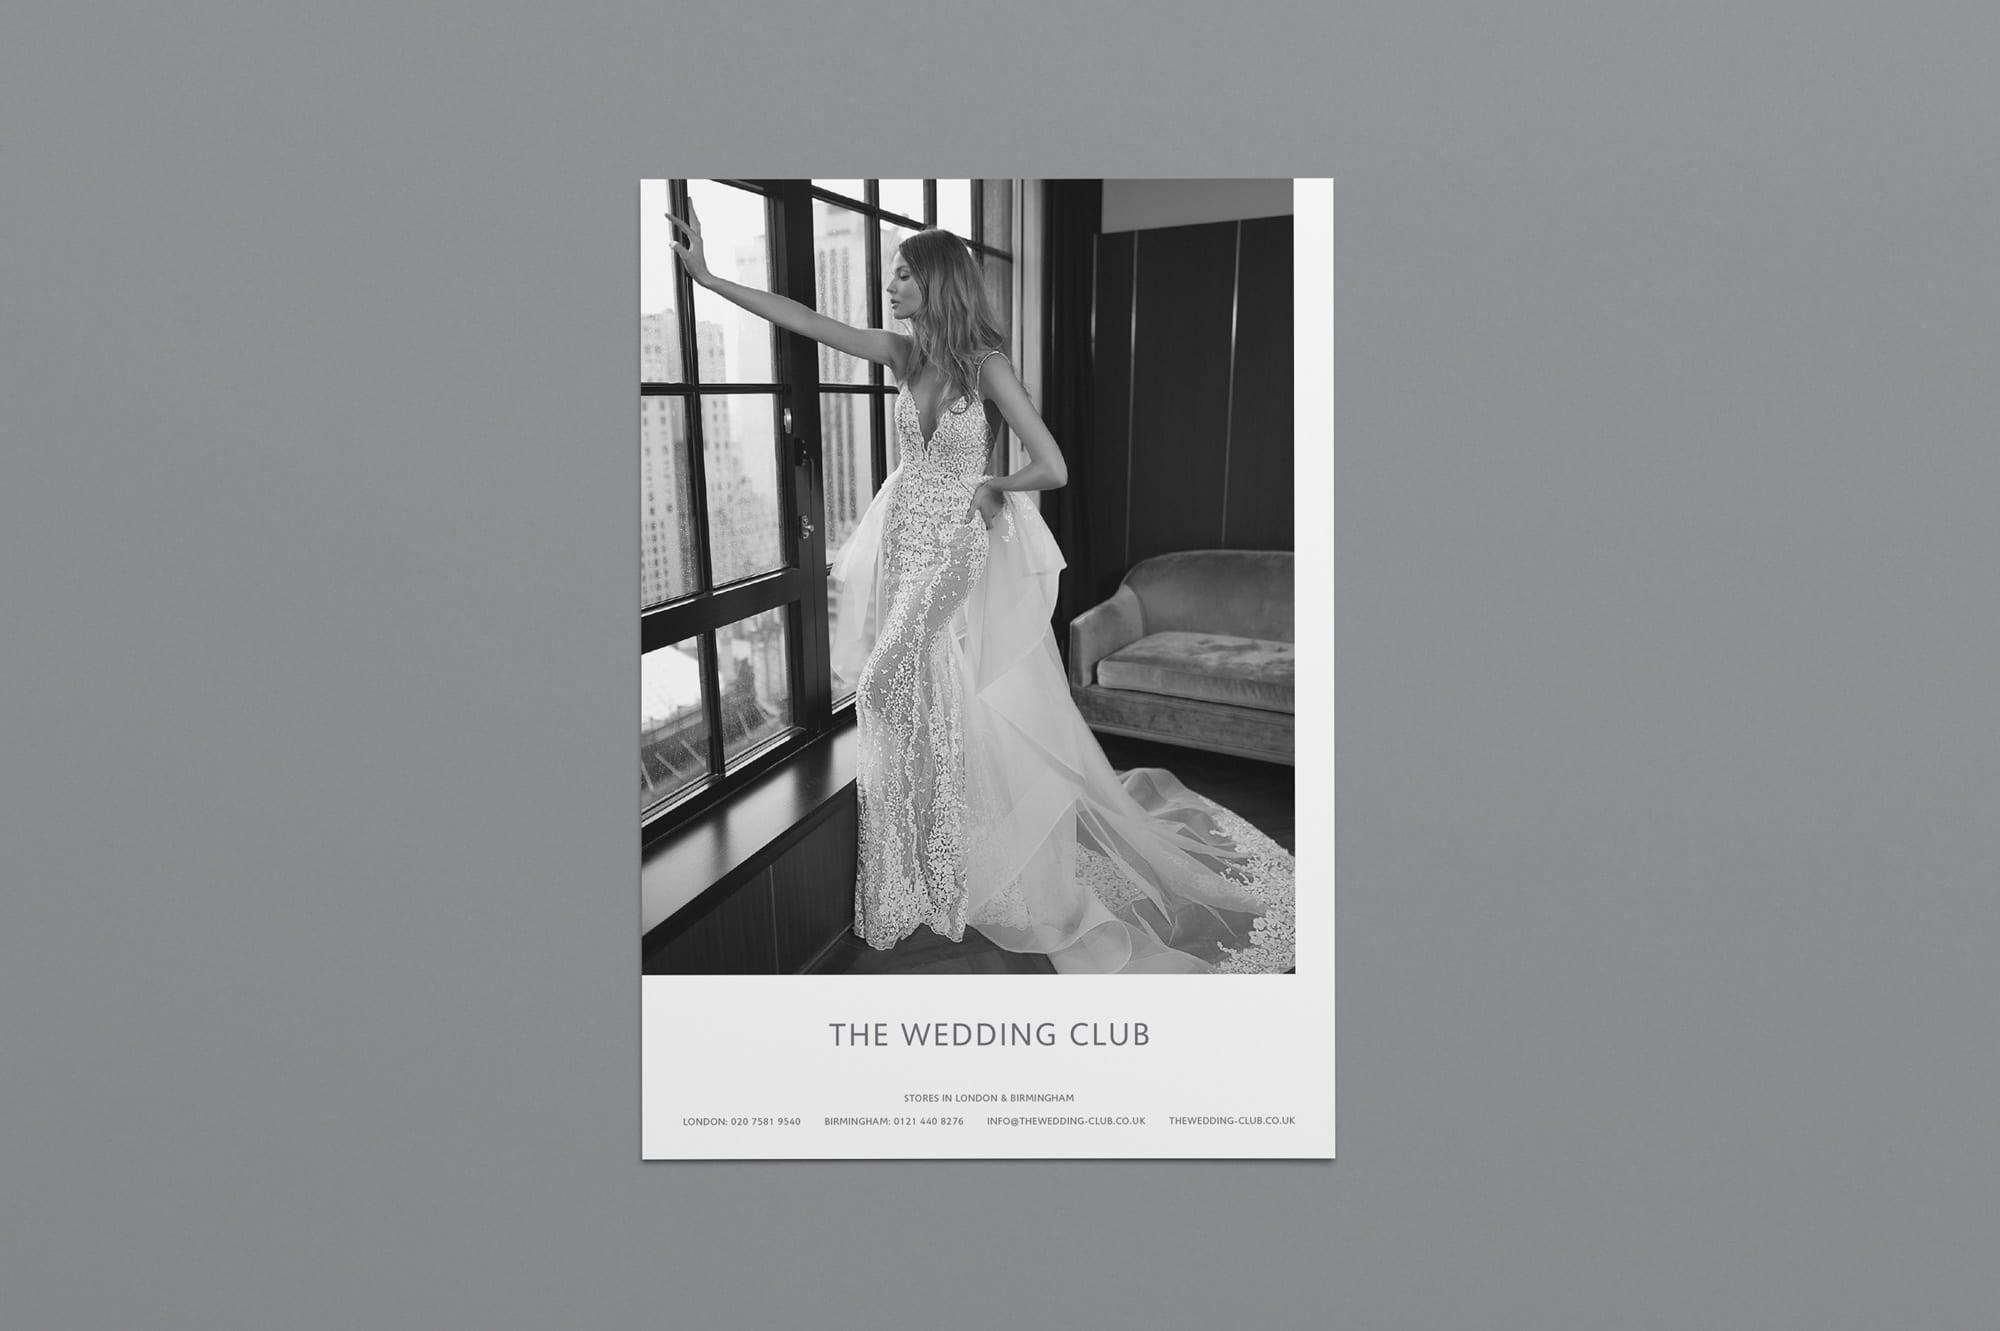 The Wedding Club Advert